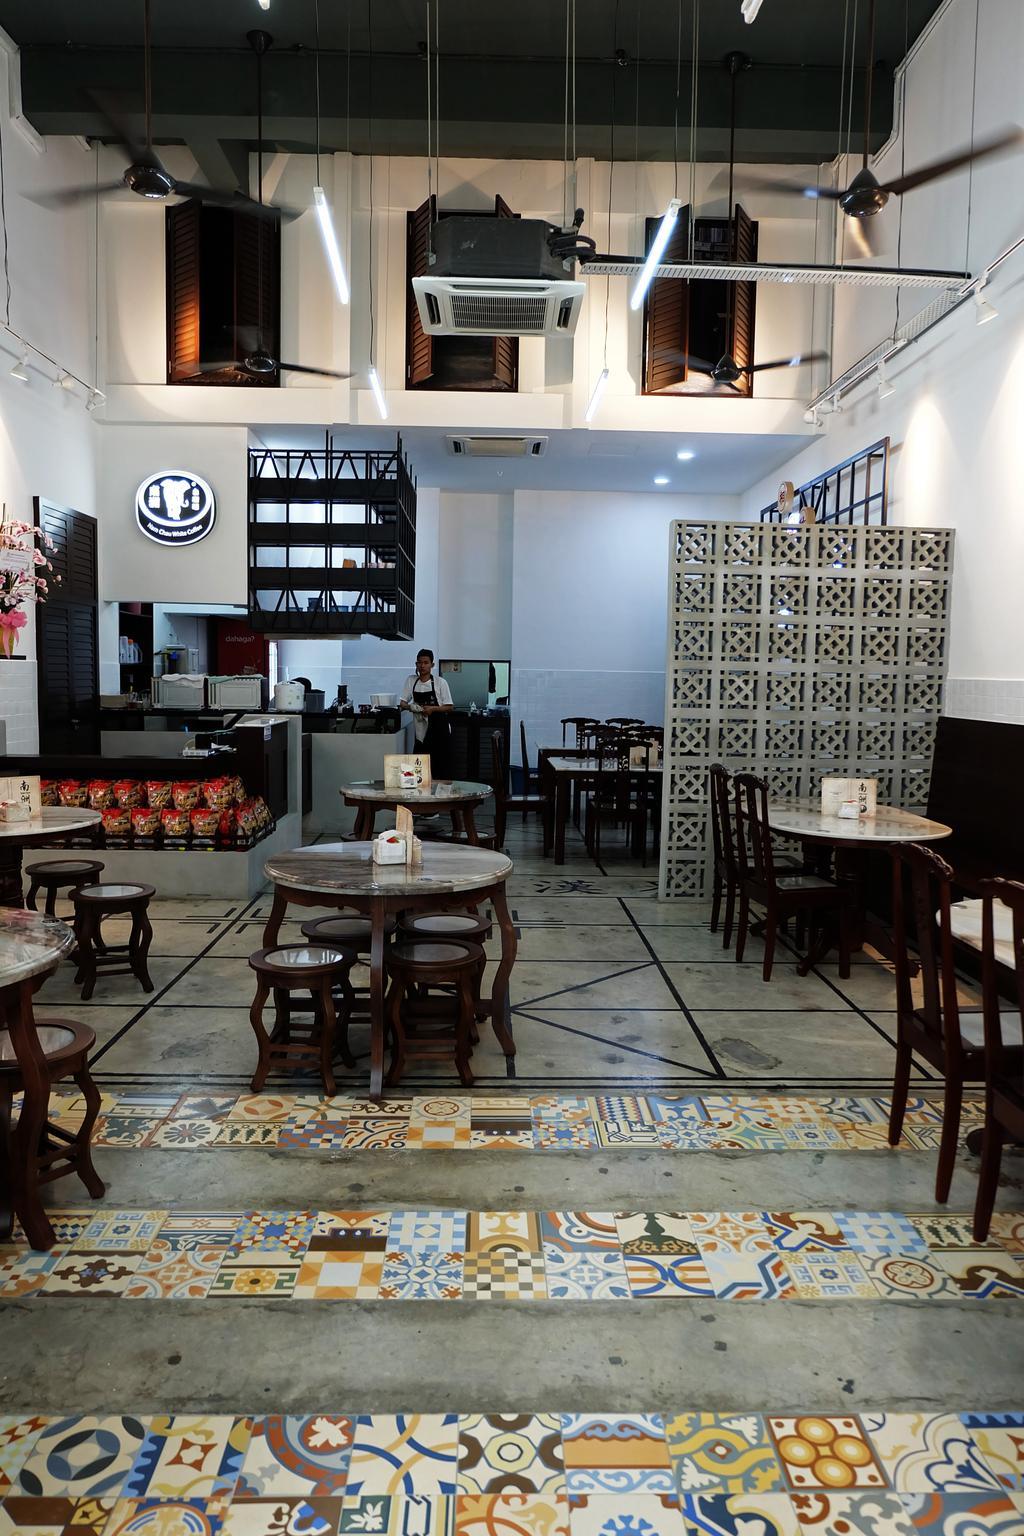 Nam Chau, Nexis Sunway Damansara, Commercial, Interior Designer, Spazio Design Sdn Bhd, Traditional, Dining Table, Furniture, Table, Chair, Cafe, Restaurant, Bench